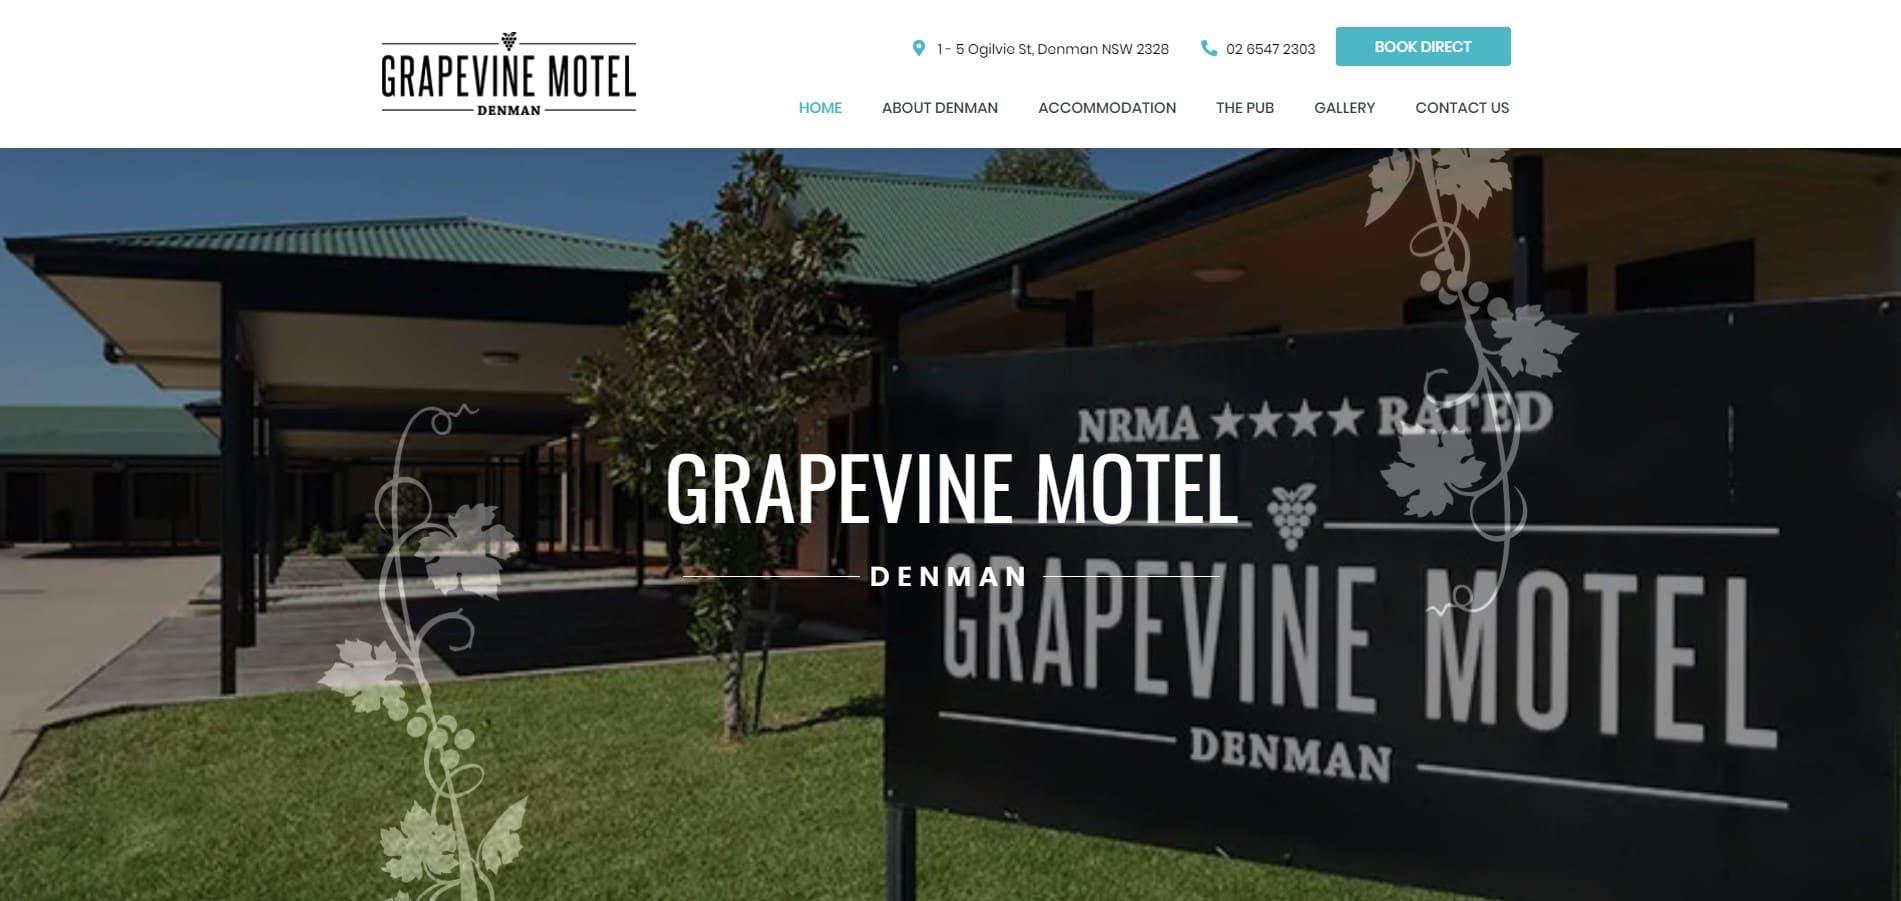 Grapevine Motel Denman Website Design & SEO Northern Rivers NSW - JezNorthWeb